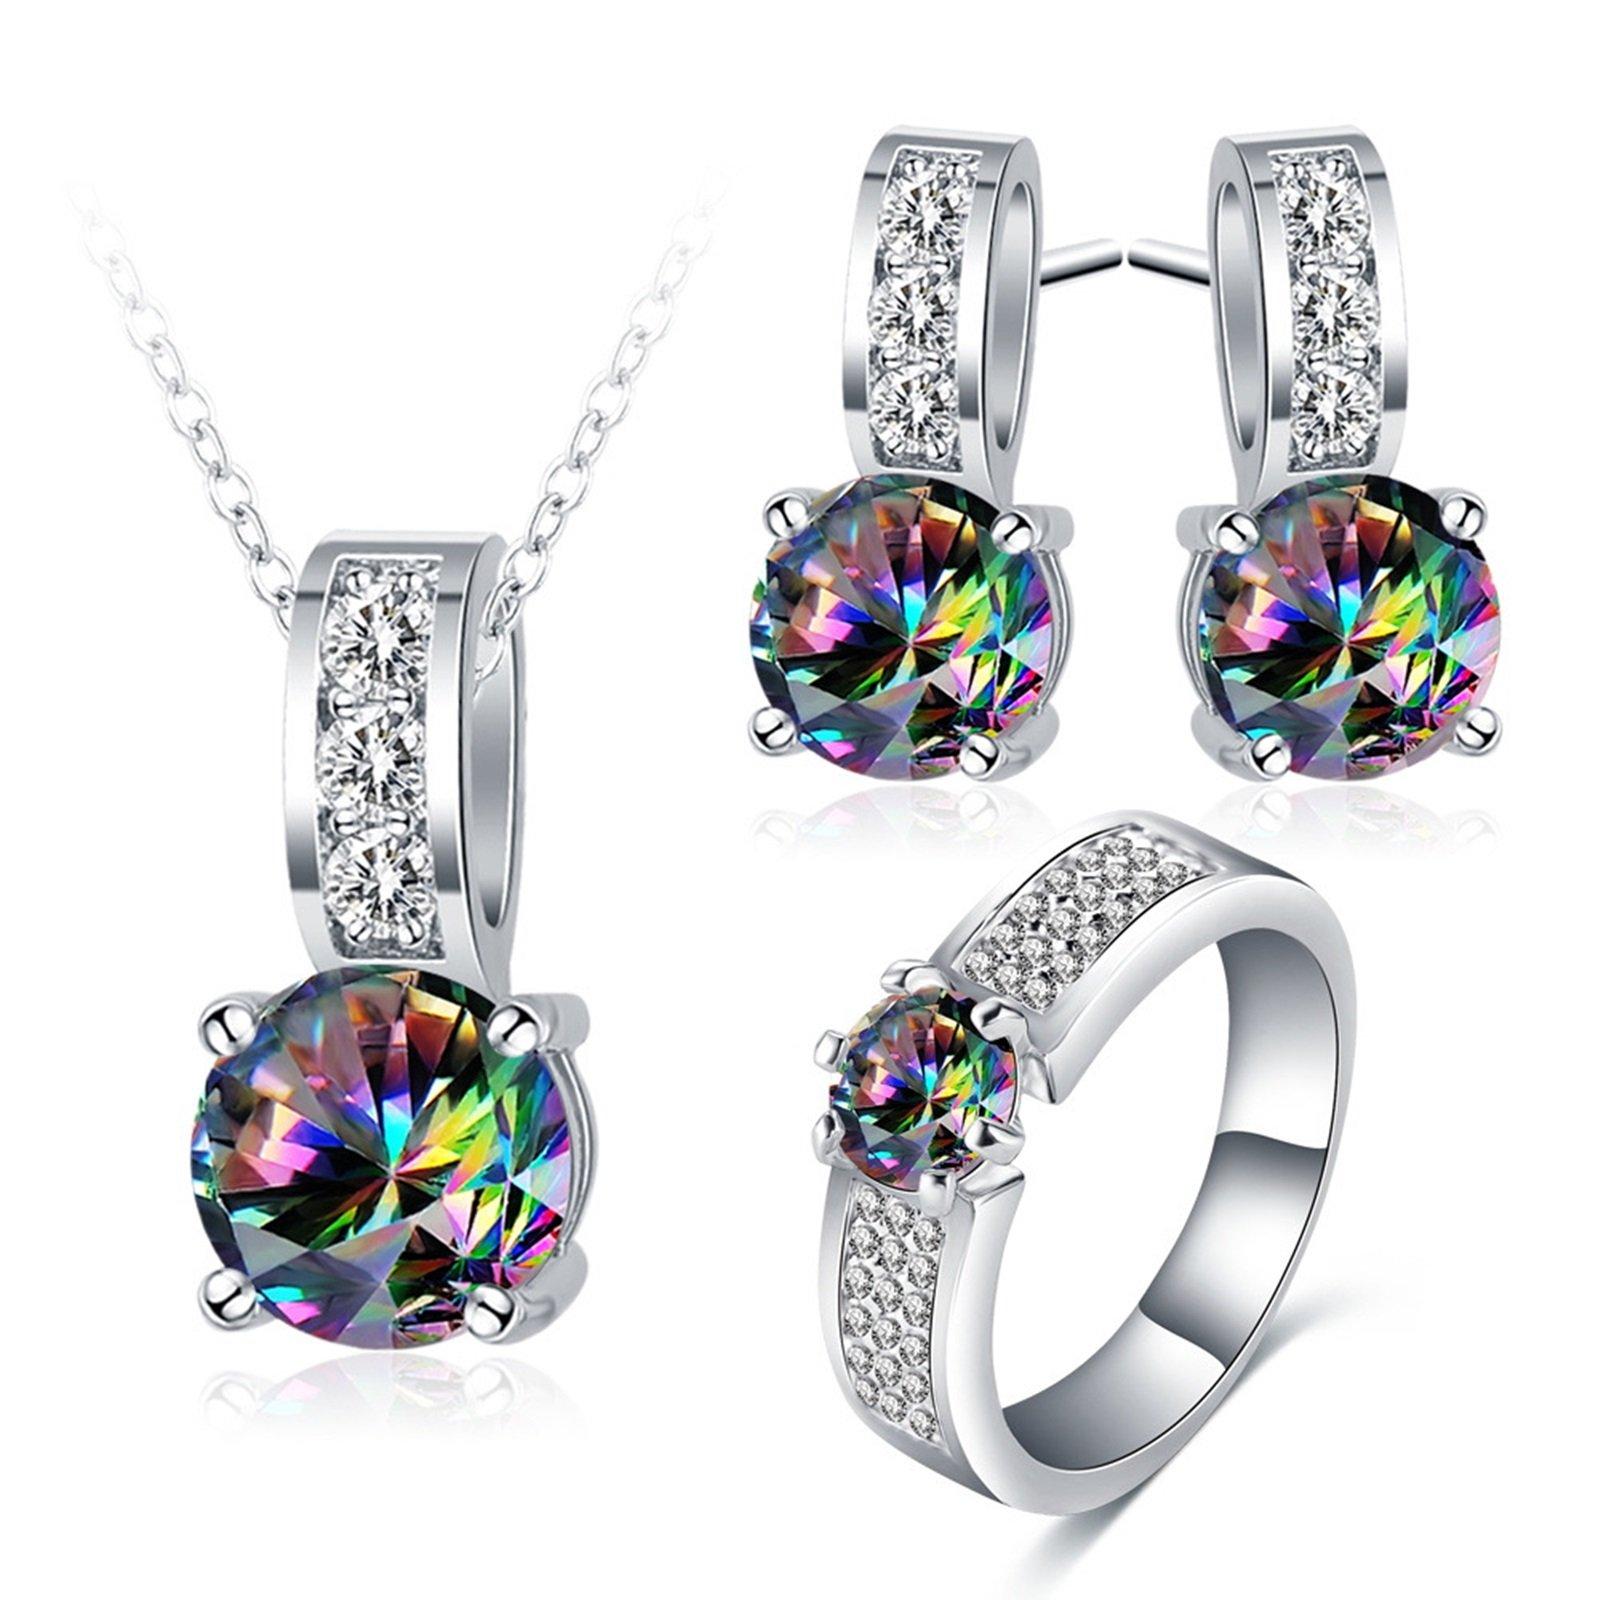 AnaZoz 3PCS Jewelry Set, Wedding Jewelry, Mysteriou Zirconia Stud Earring Dangle Women Engagement Ring Necklace Set with Gift Box Size 5